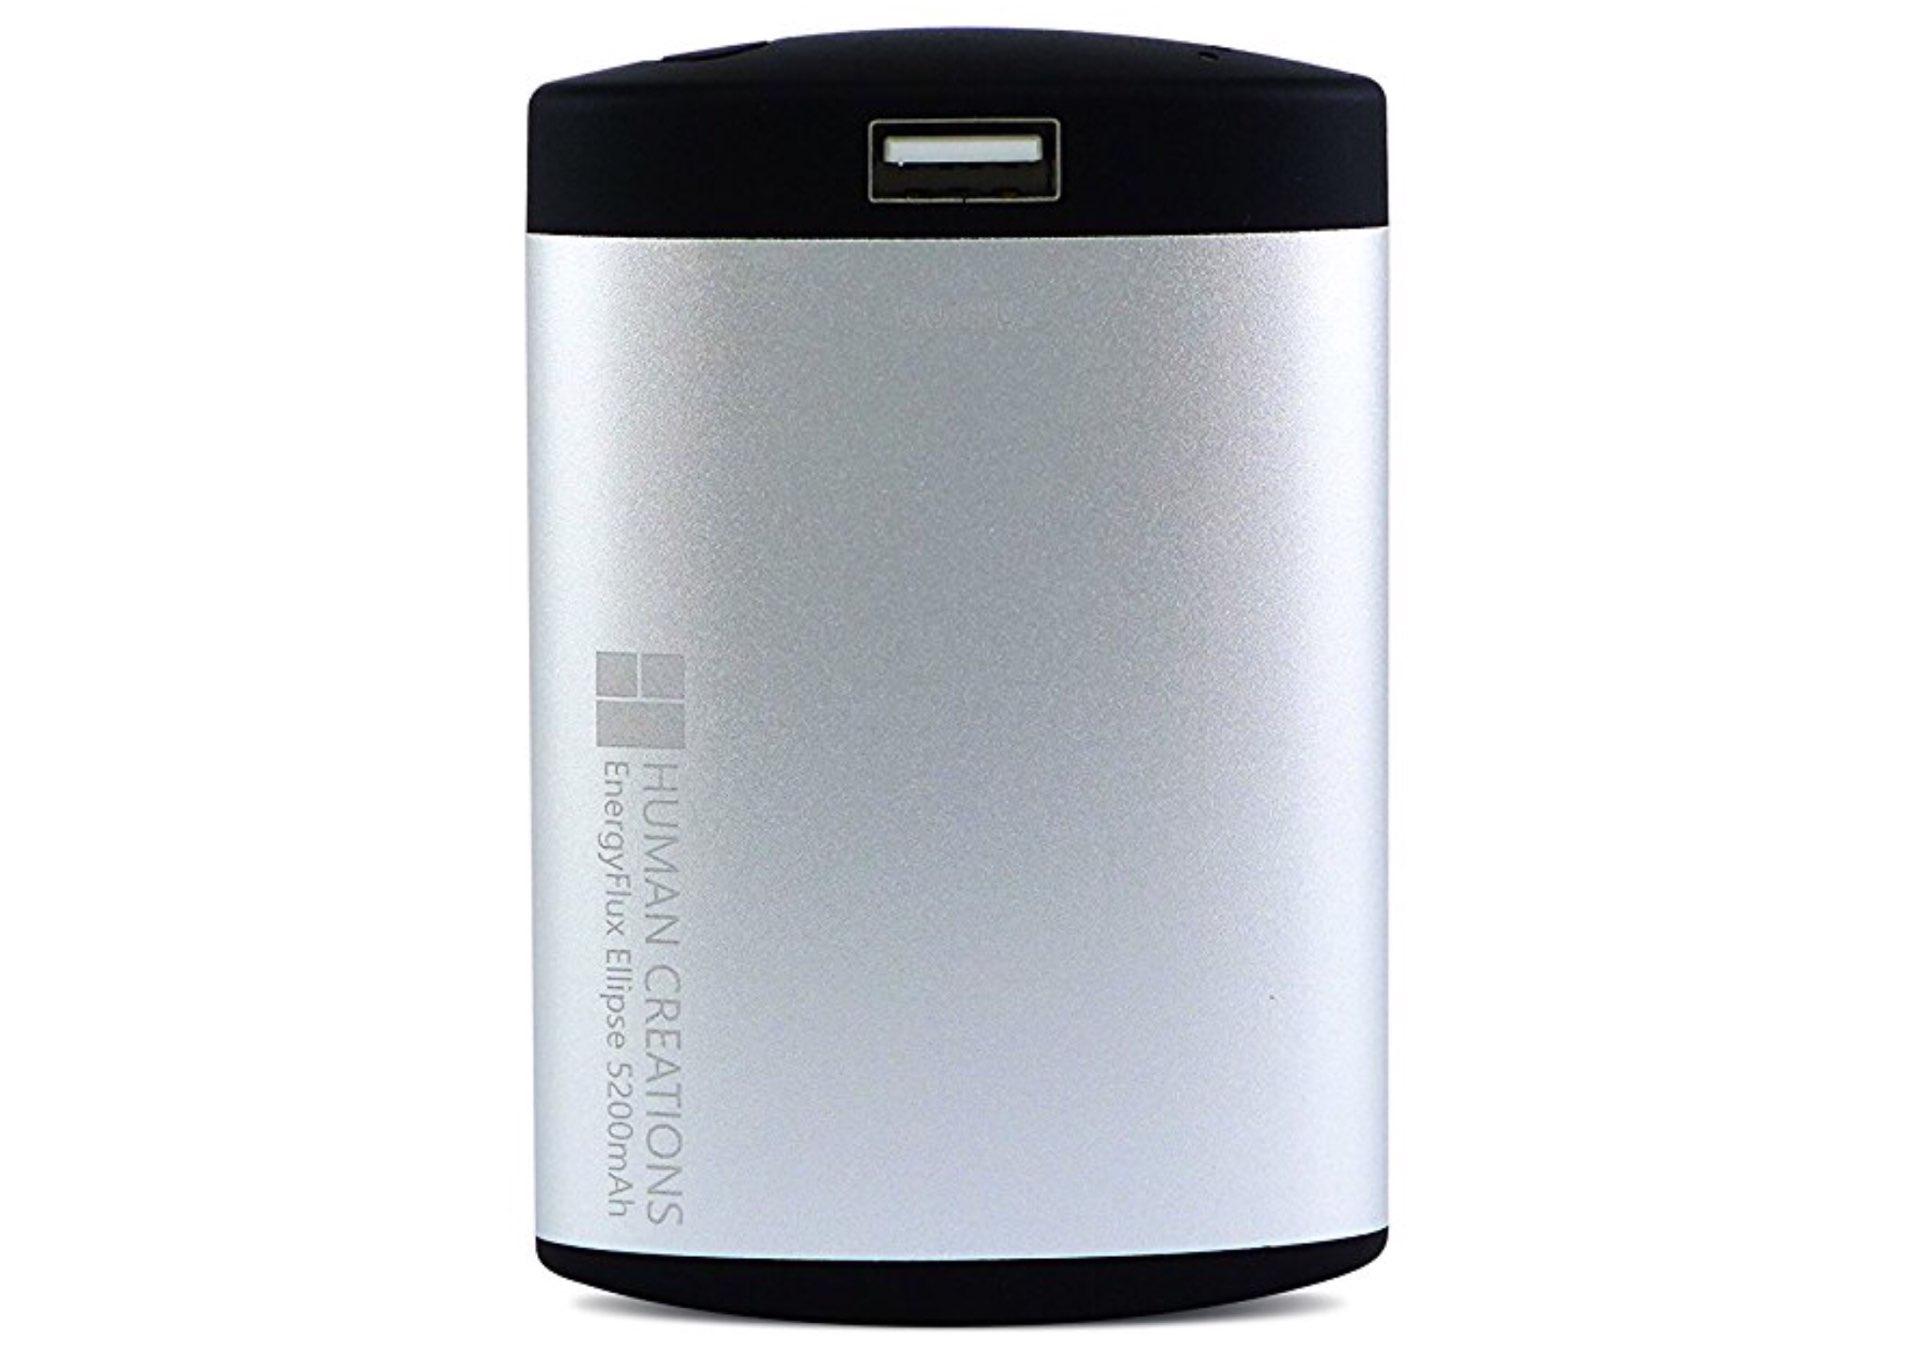 energyflux-ellipse-5200-mah-rechargeable-hand-warmer